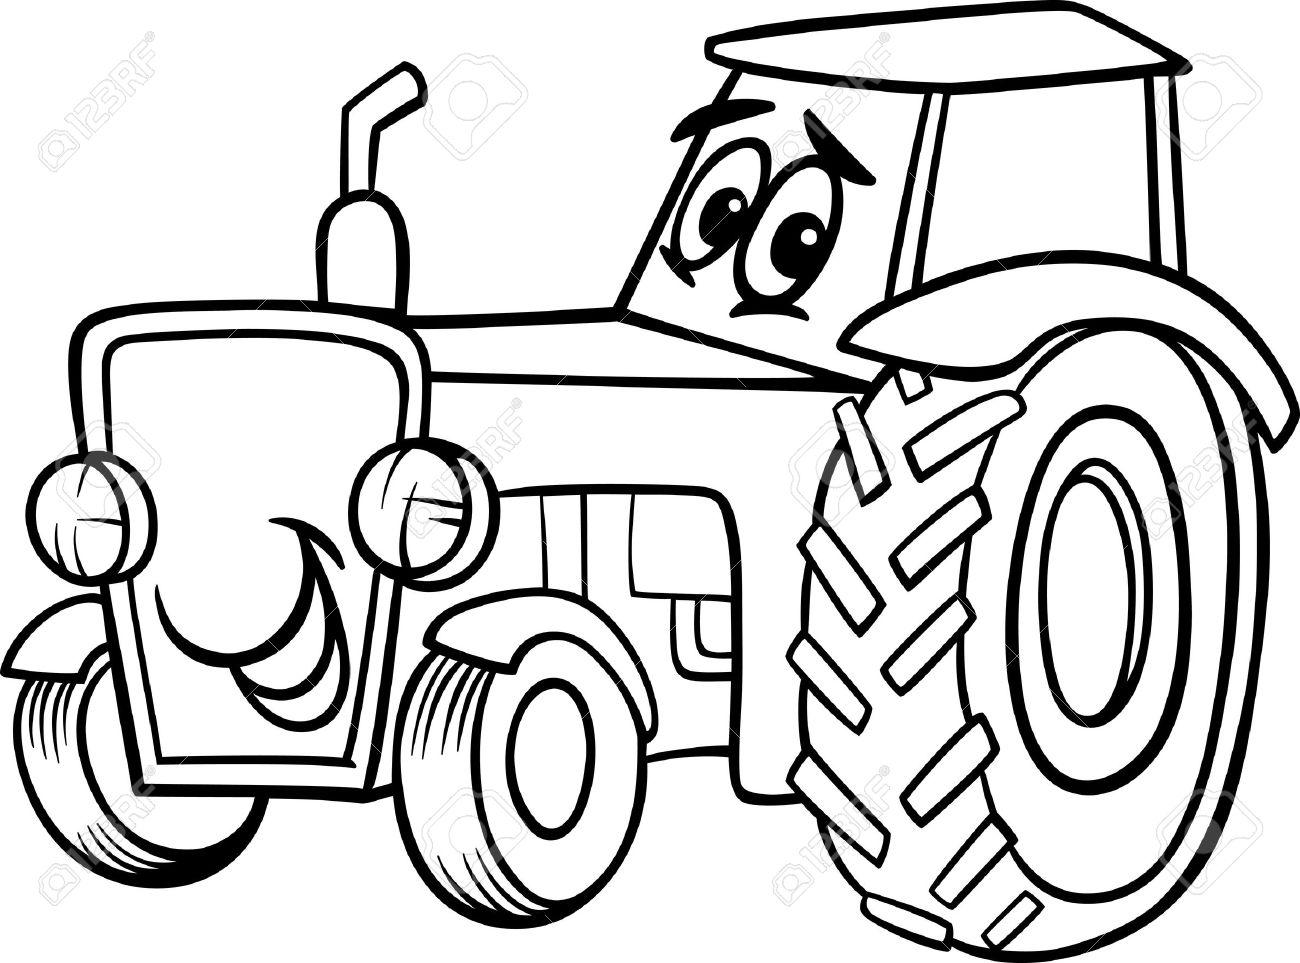 Раскраска онлайн трактор том